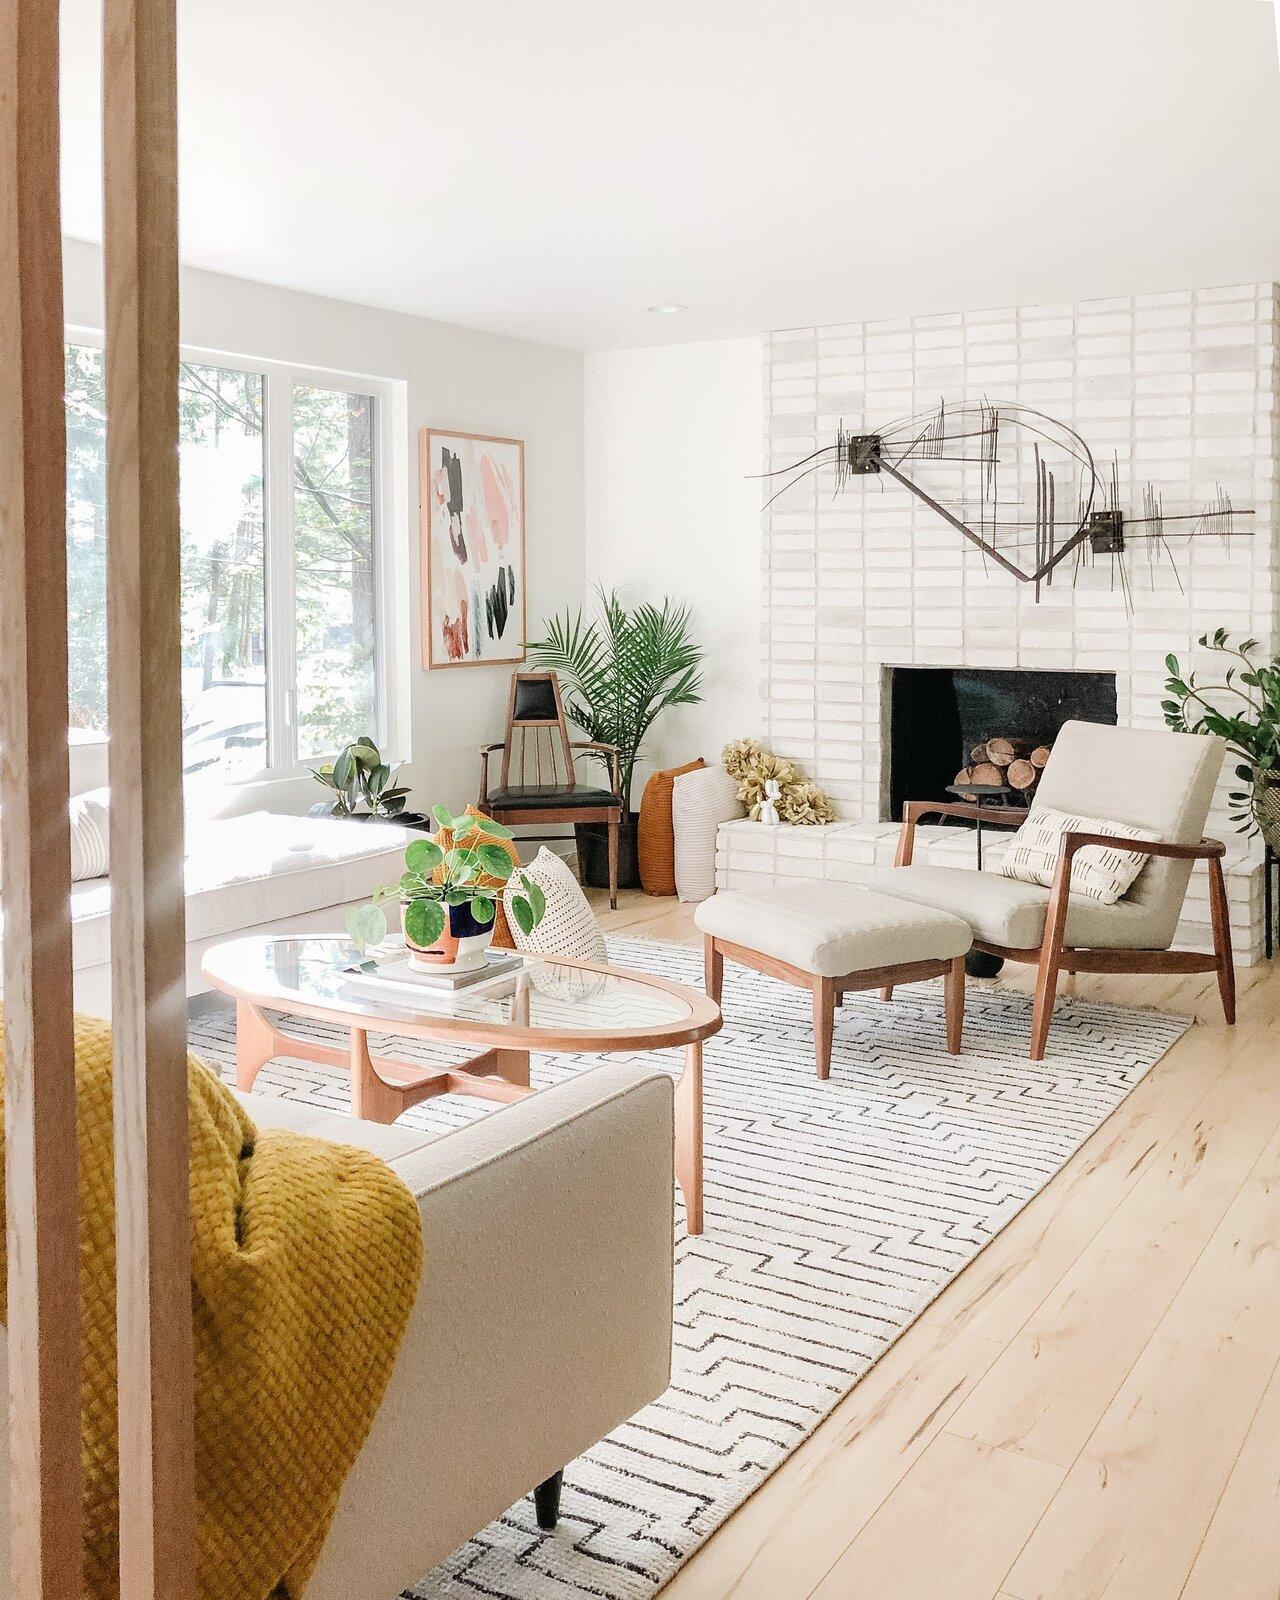 Devlin Crawford Residence by SarMerr Design and Alli Devlin